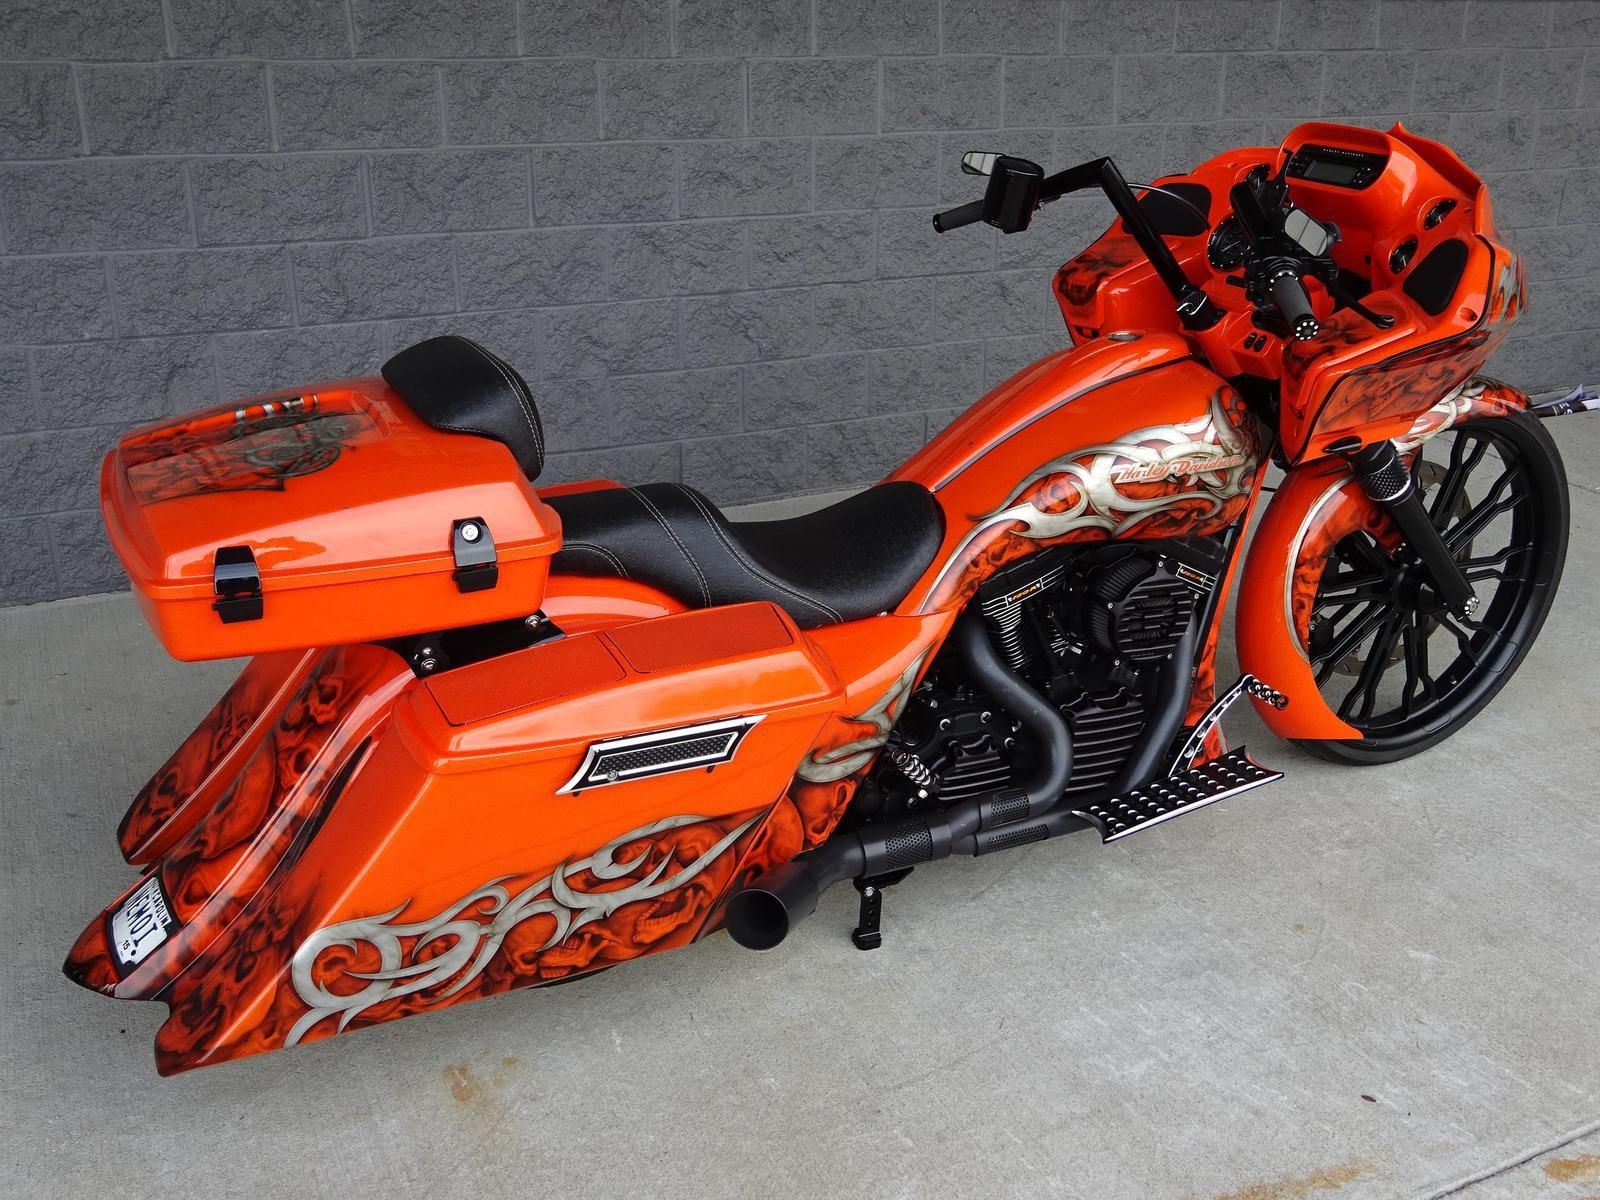 2013 Harley-Davidson ROAD GLIDE CUSTOM – SCREAMIN' EAGLE 120R MOTOR – 26″ BIG WH…